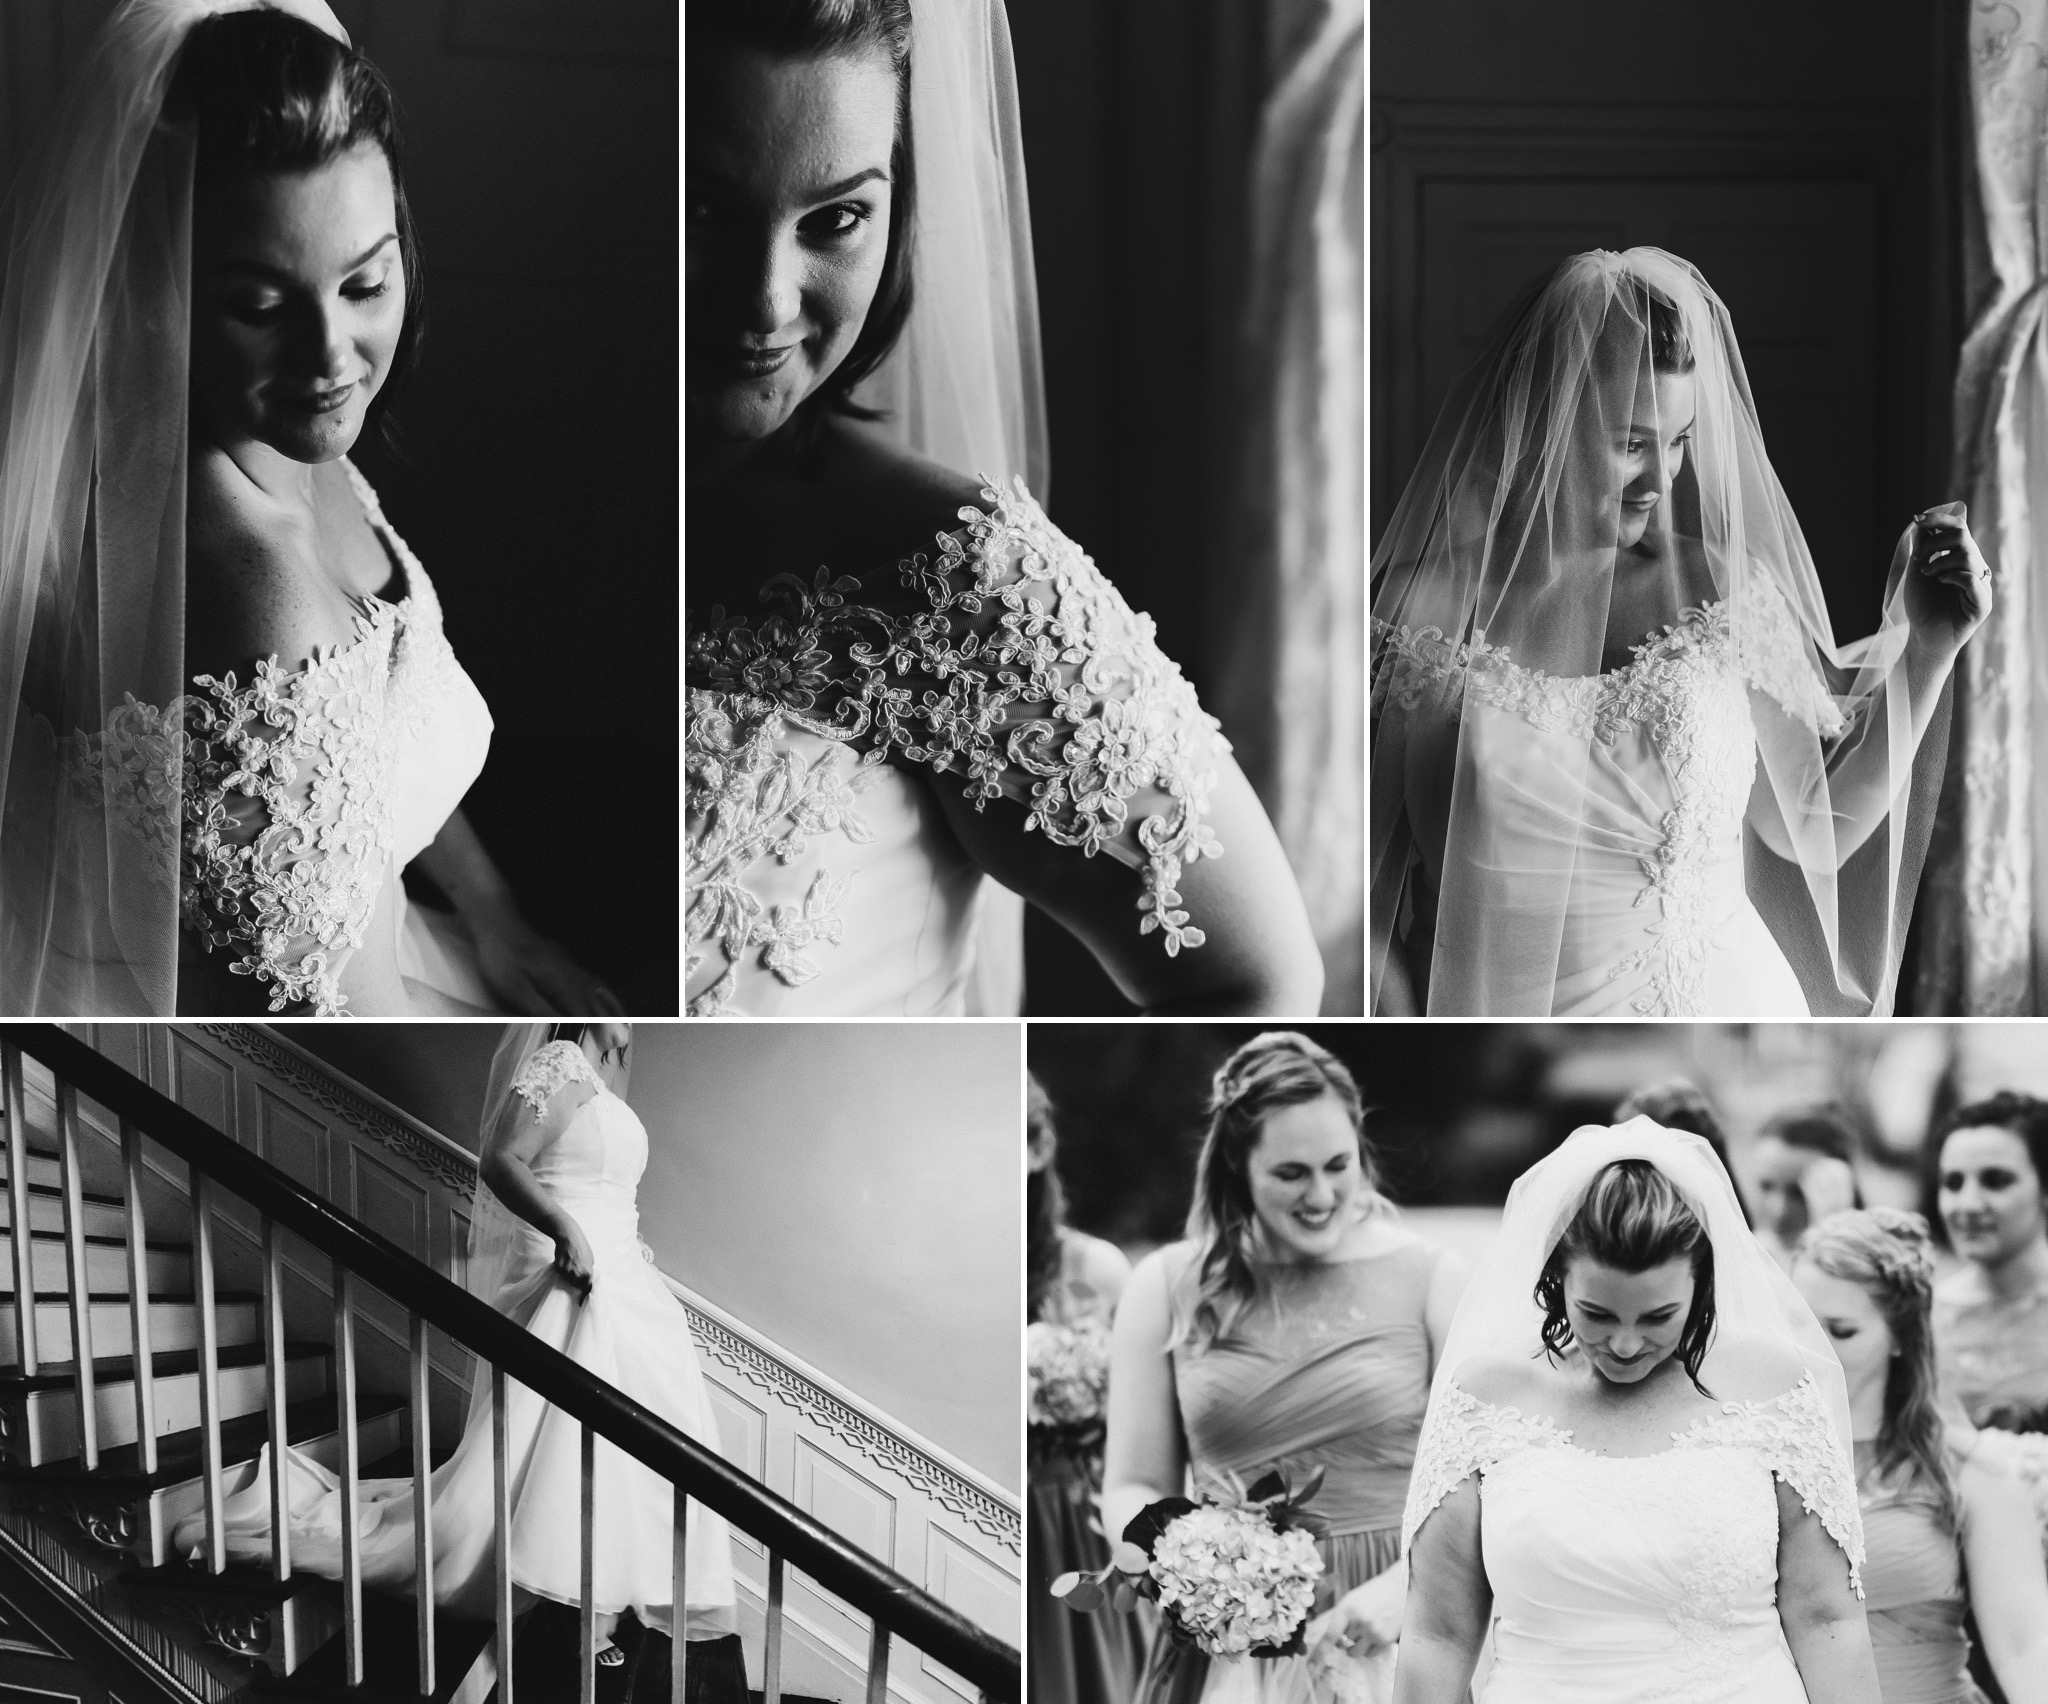 intimate_kyle_house_wedding_virginia_jonathan_hannah_photography-4.jpg